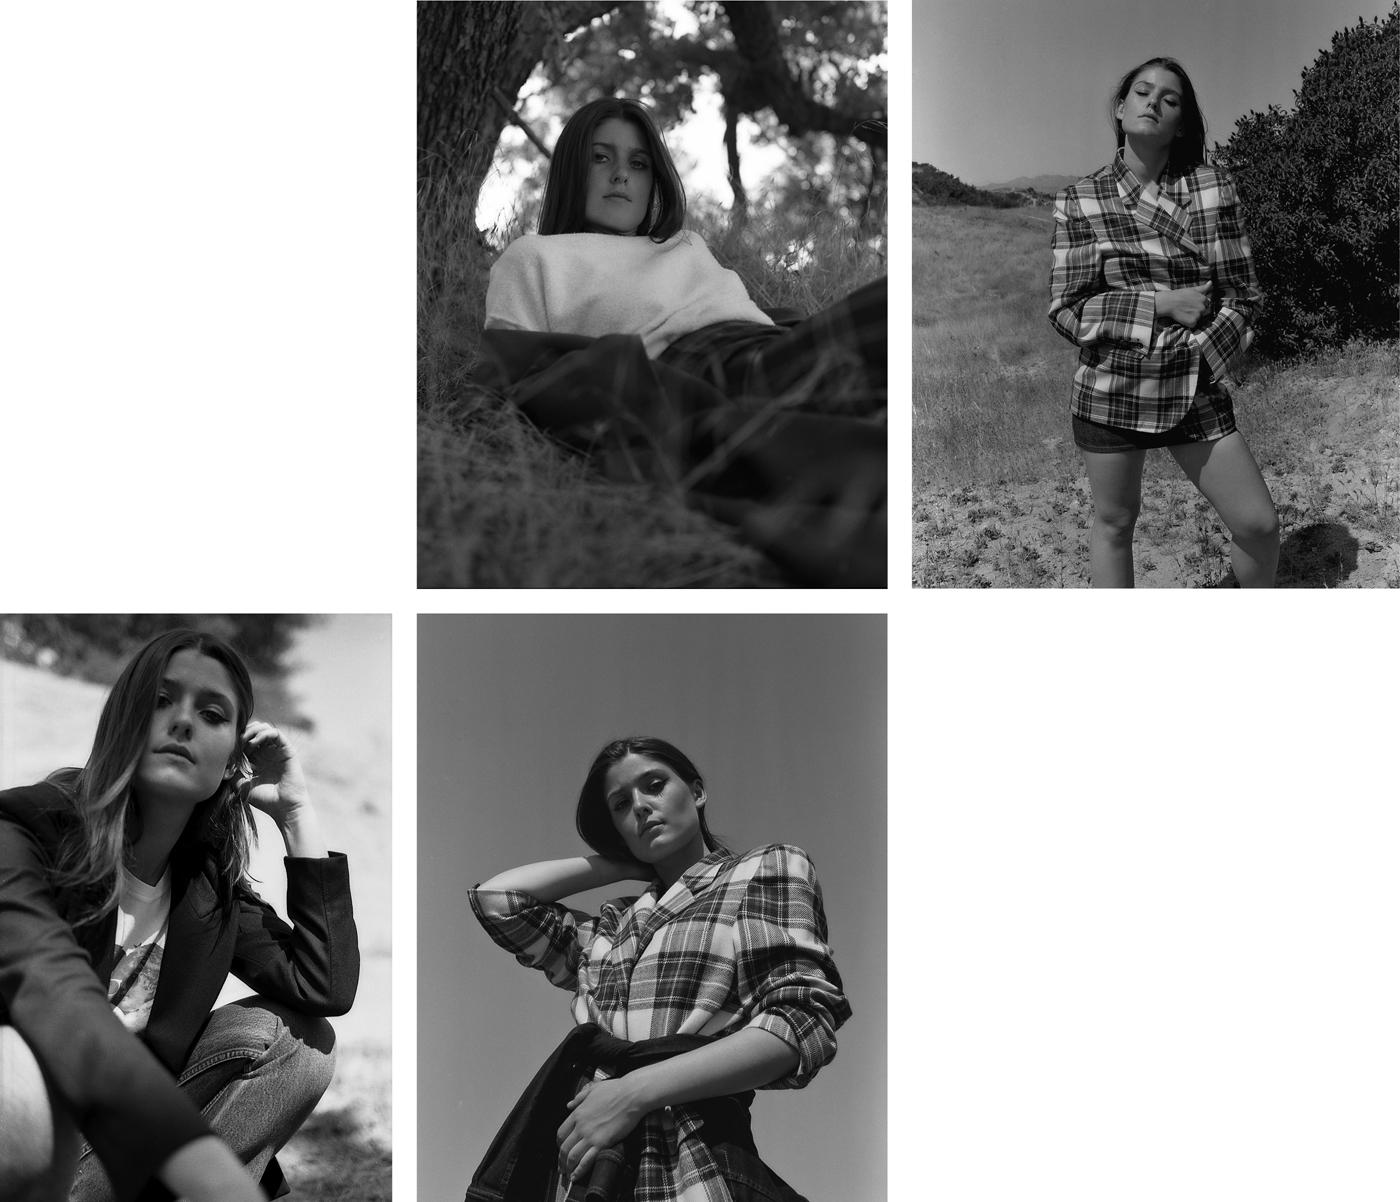 Clockwise from top left: Coat by Jil Sander. Sweatshirt by Fiorucci. Vintage skirt.Vintage jacket by Alan Austin. Skirt by A.P.C.Vintage jacket by Alan Austin. Jacket, tied around waist, by Stella McCartney. Skirt by A.P.C.Jacket by Stella McCartney. T-shirt by Fiorucci. Vintage jeans by Levi's.